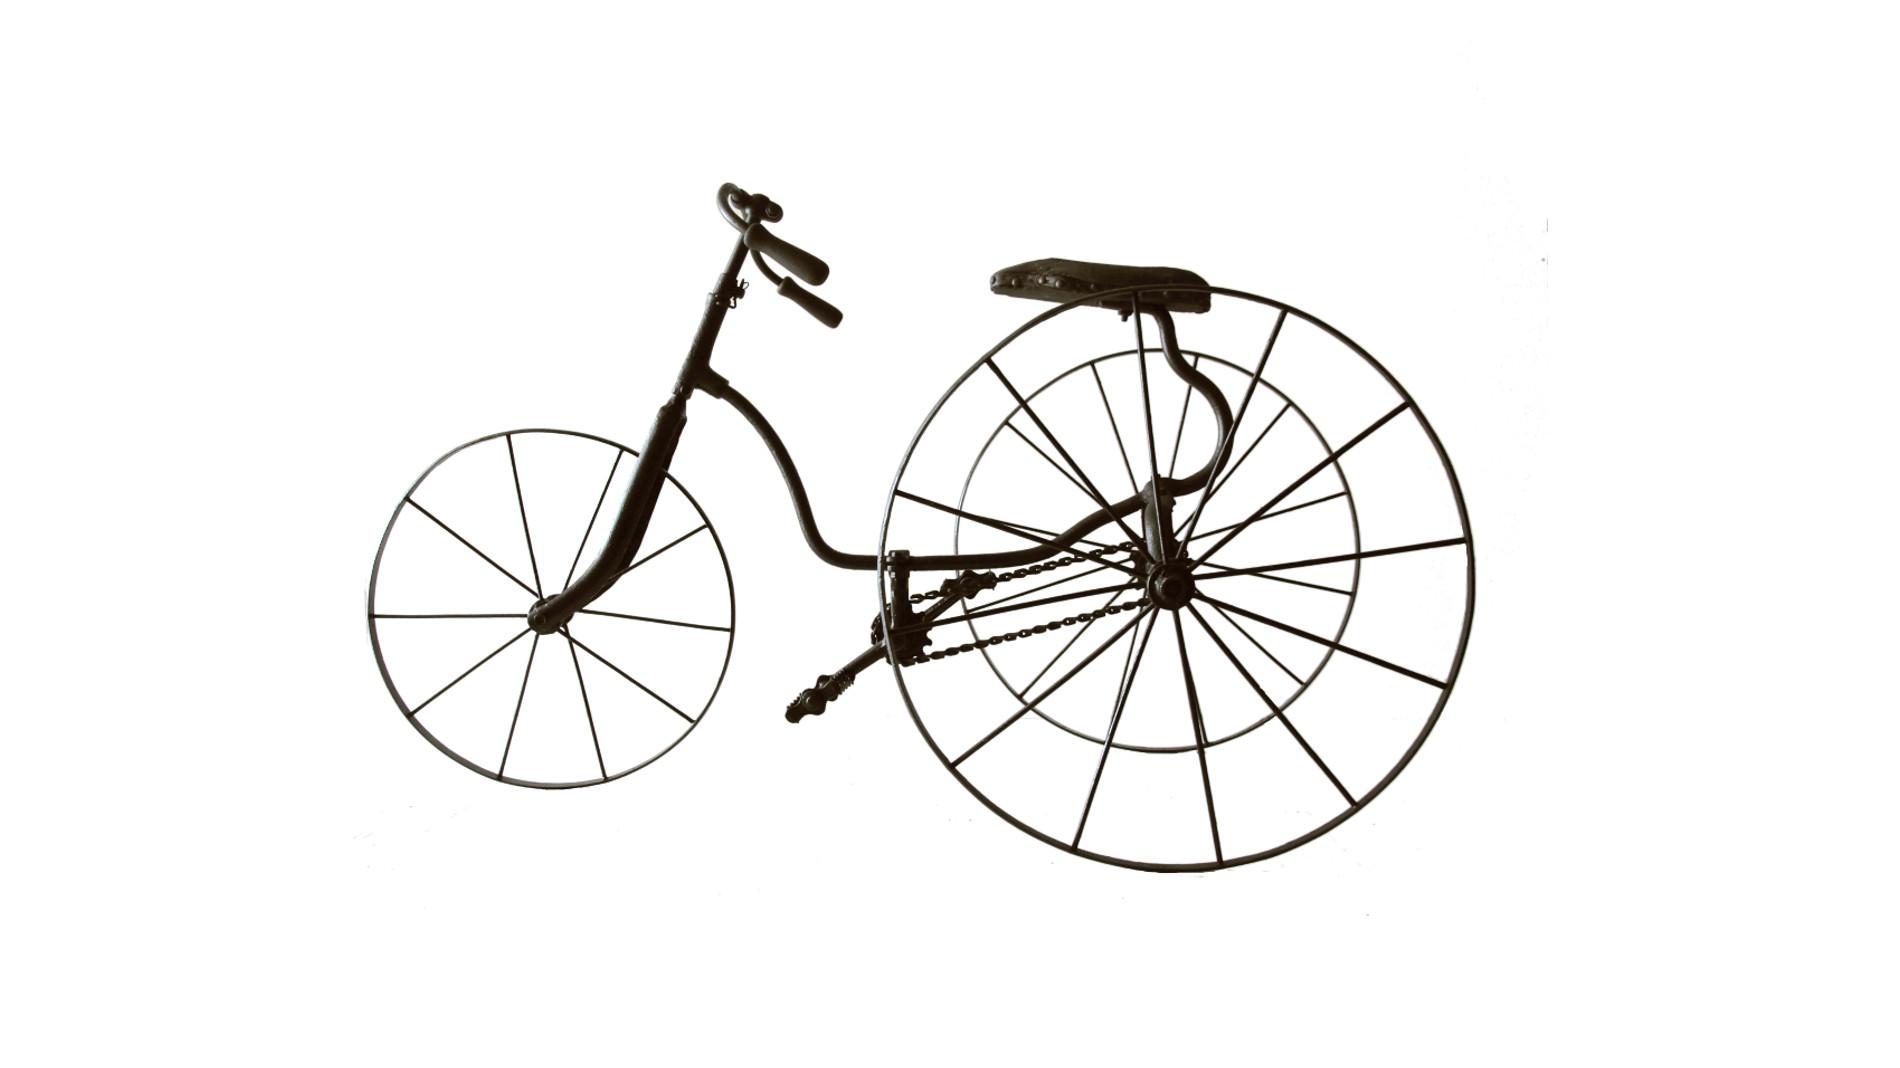 triciclo2.jpg